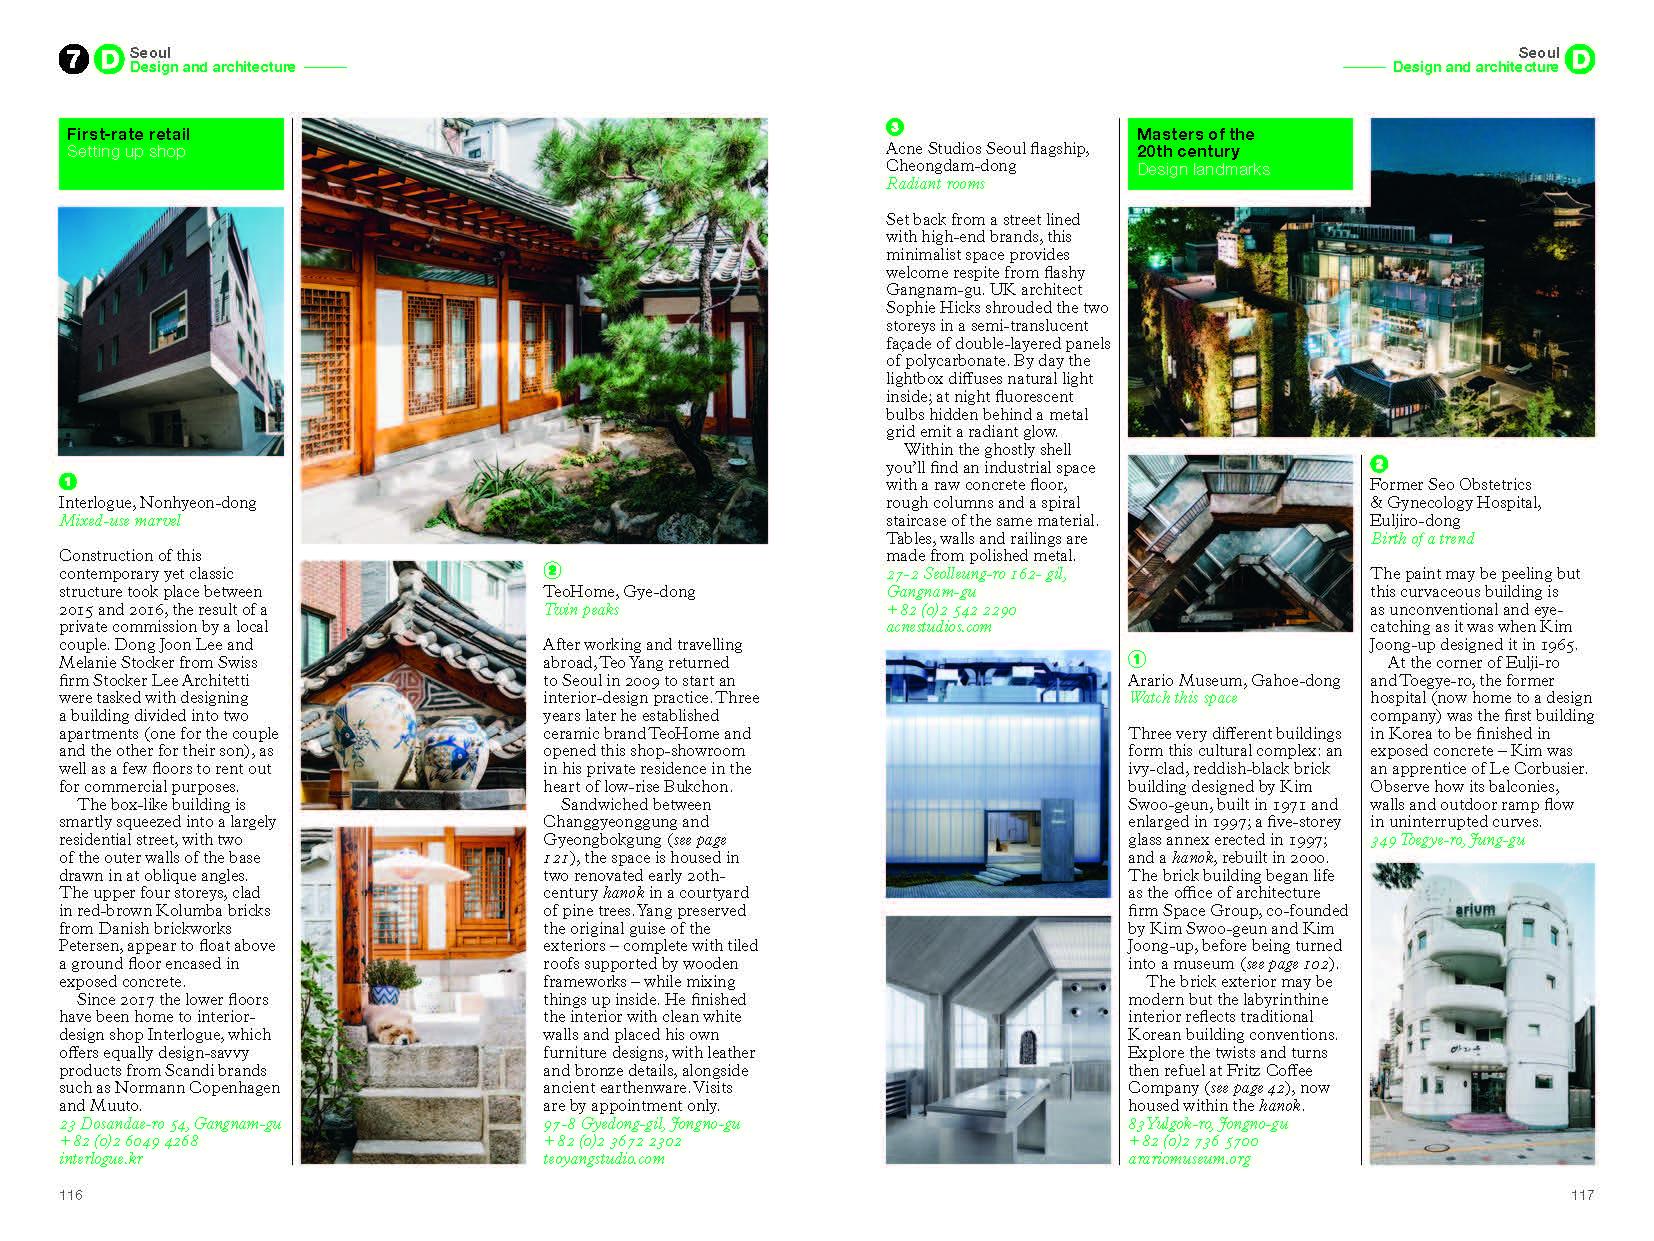 108-123_seoul_d&a_V3_Page_5.jpg